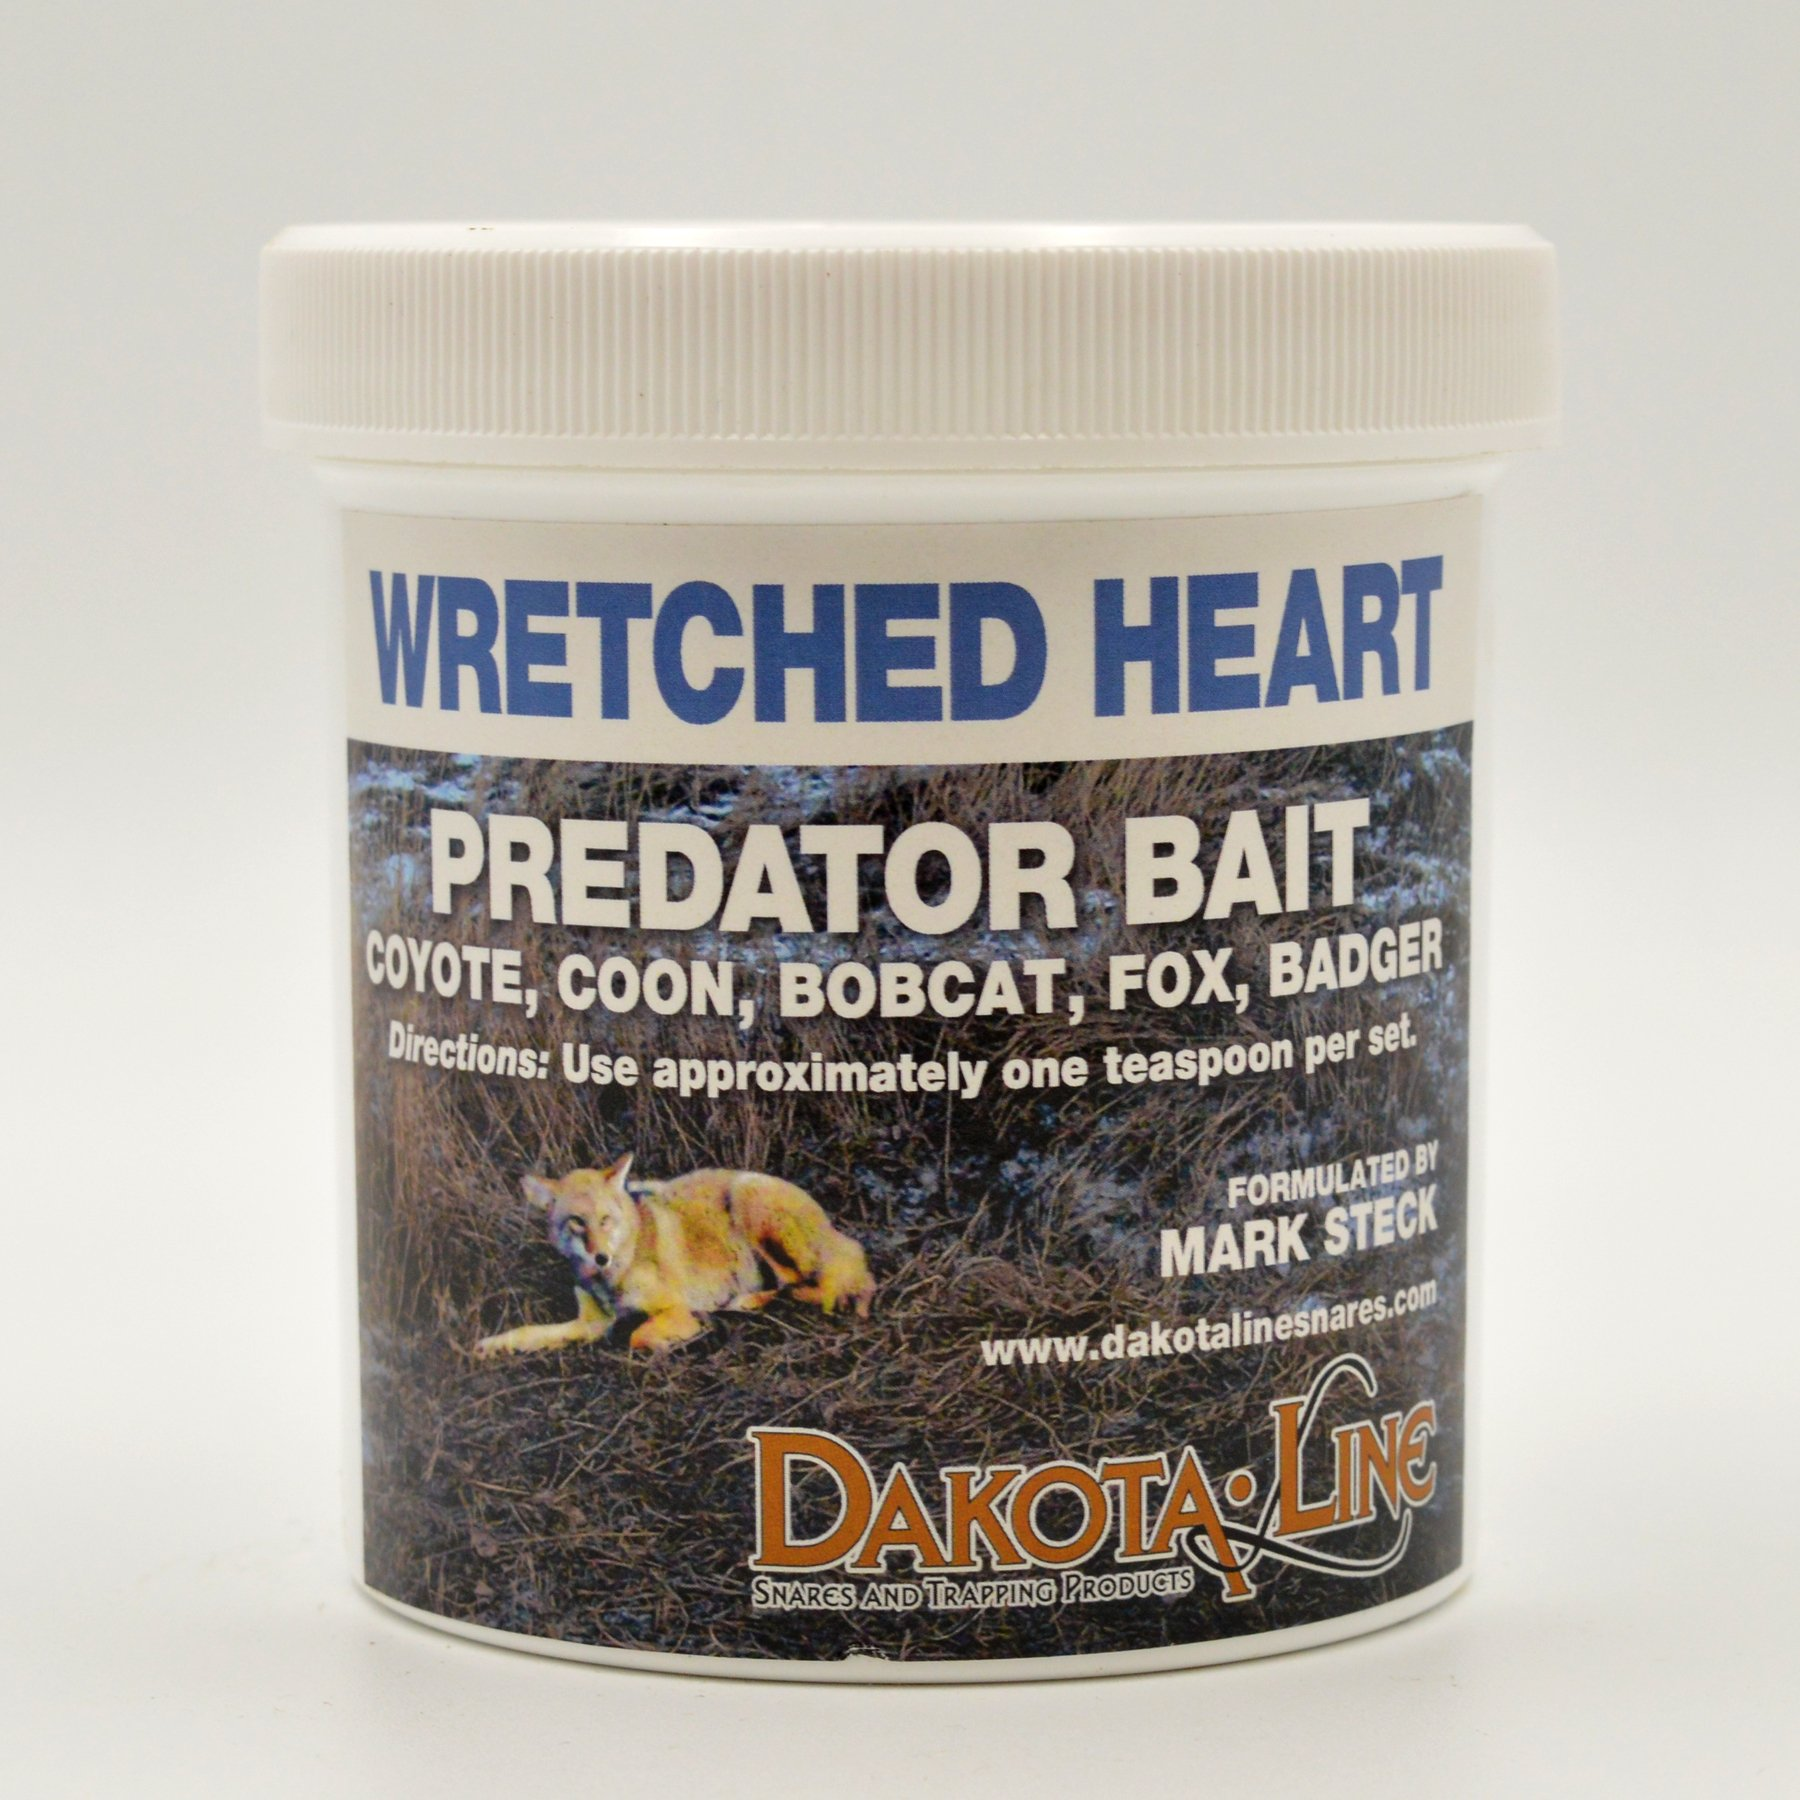 1 Pint WRETCHED HEART Predator Bait by DakotaLine (Image #1)